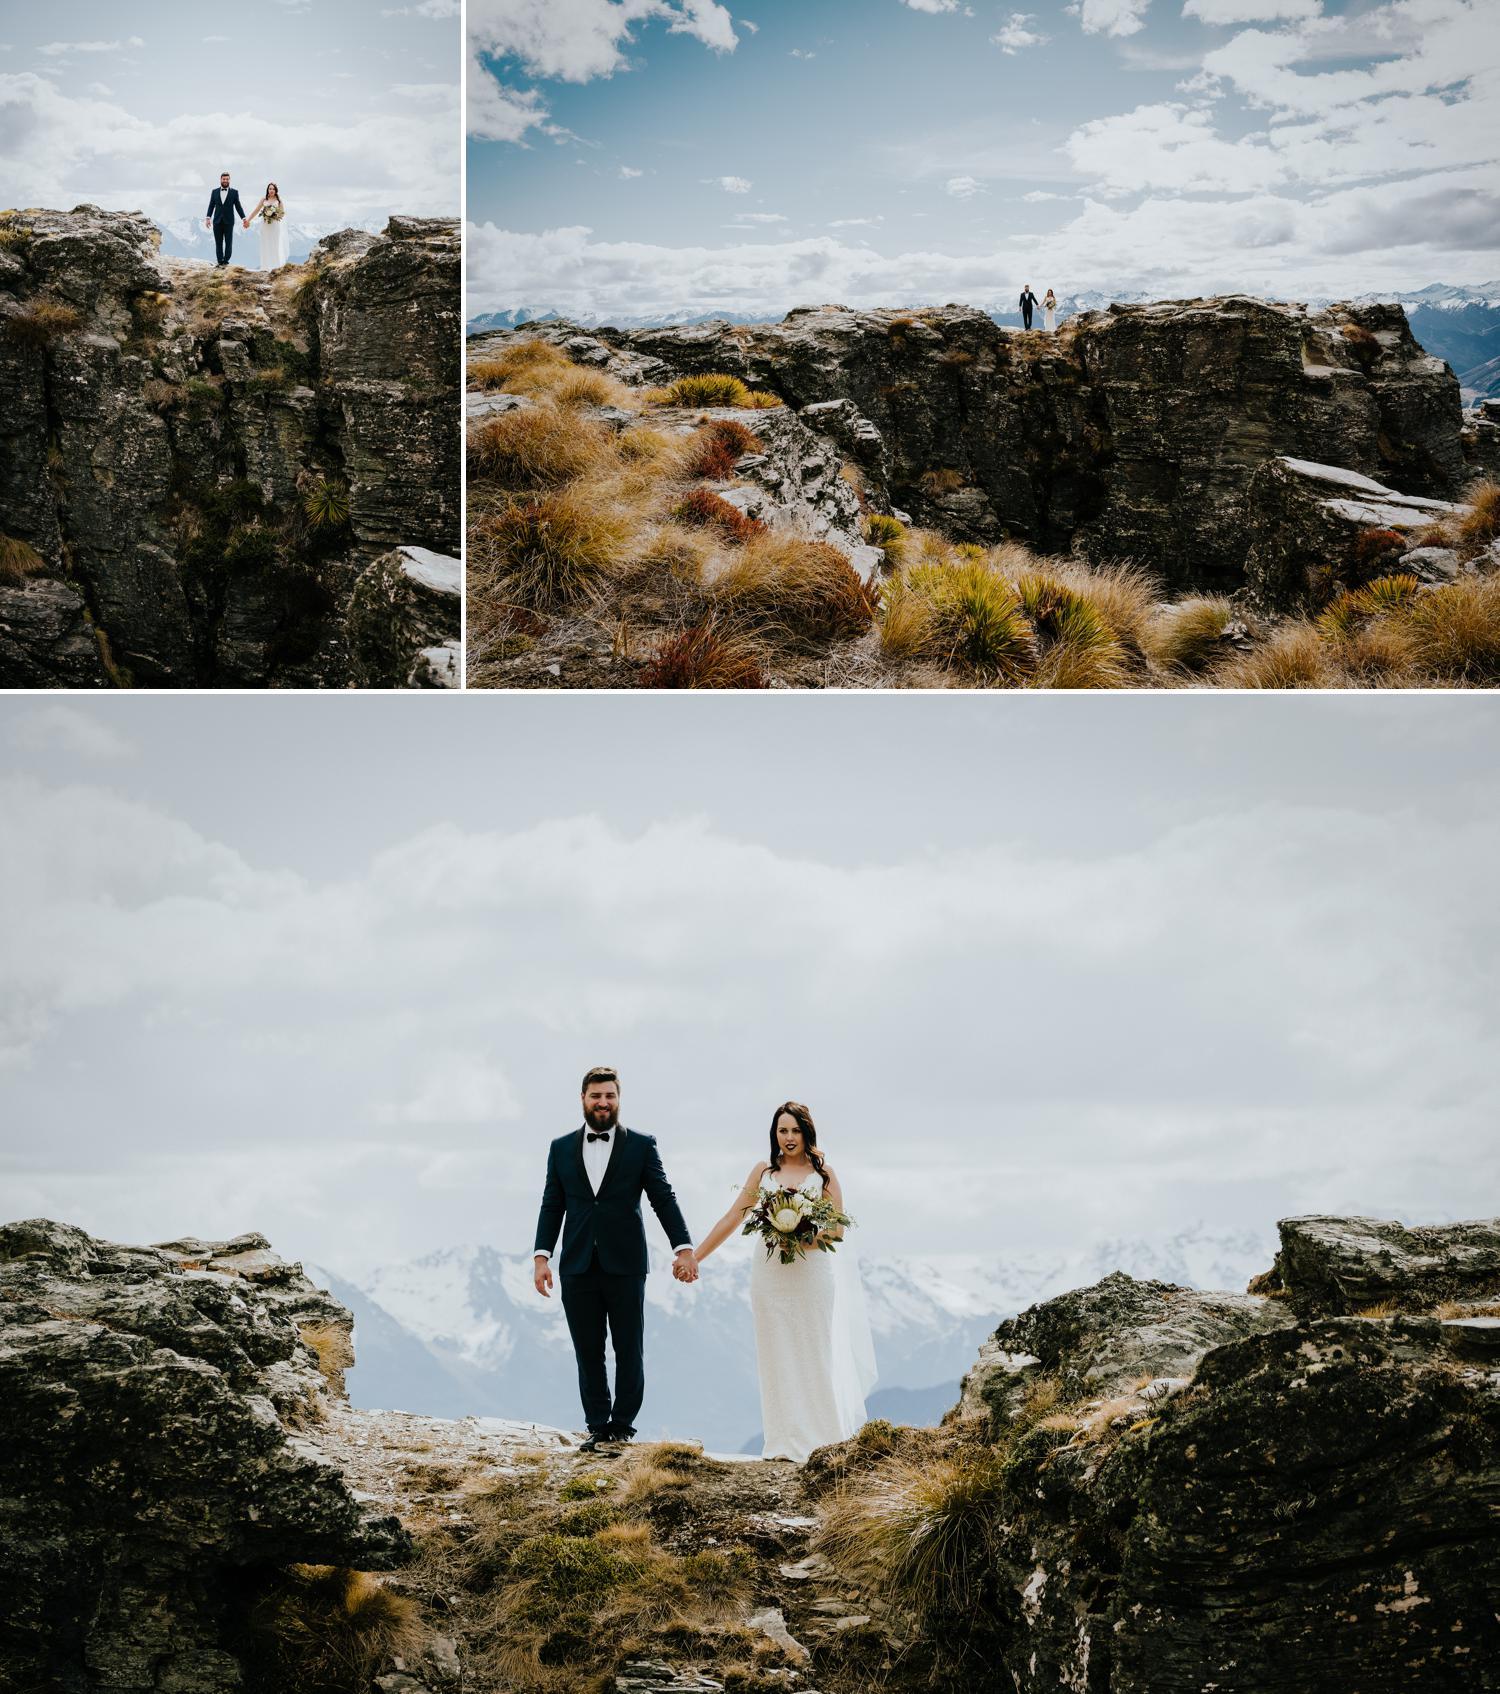 The Ledge wedding photograph